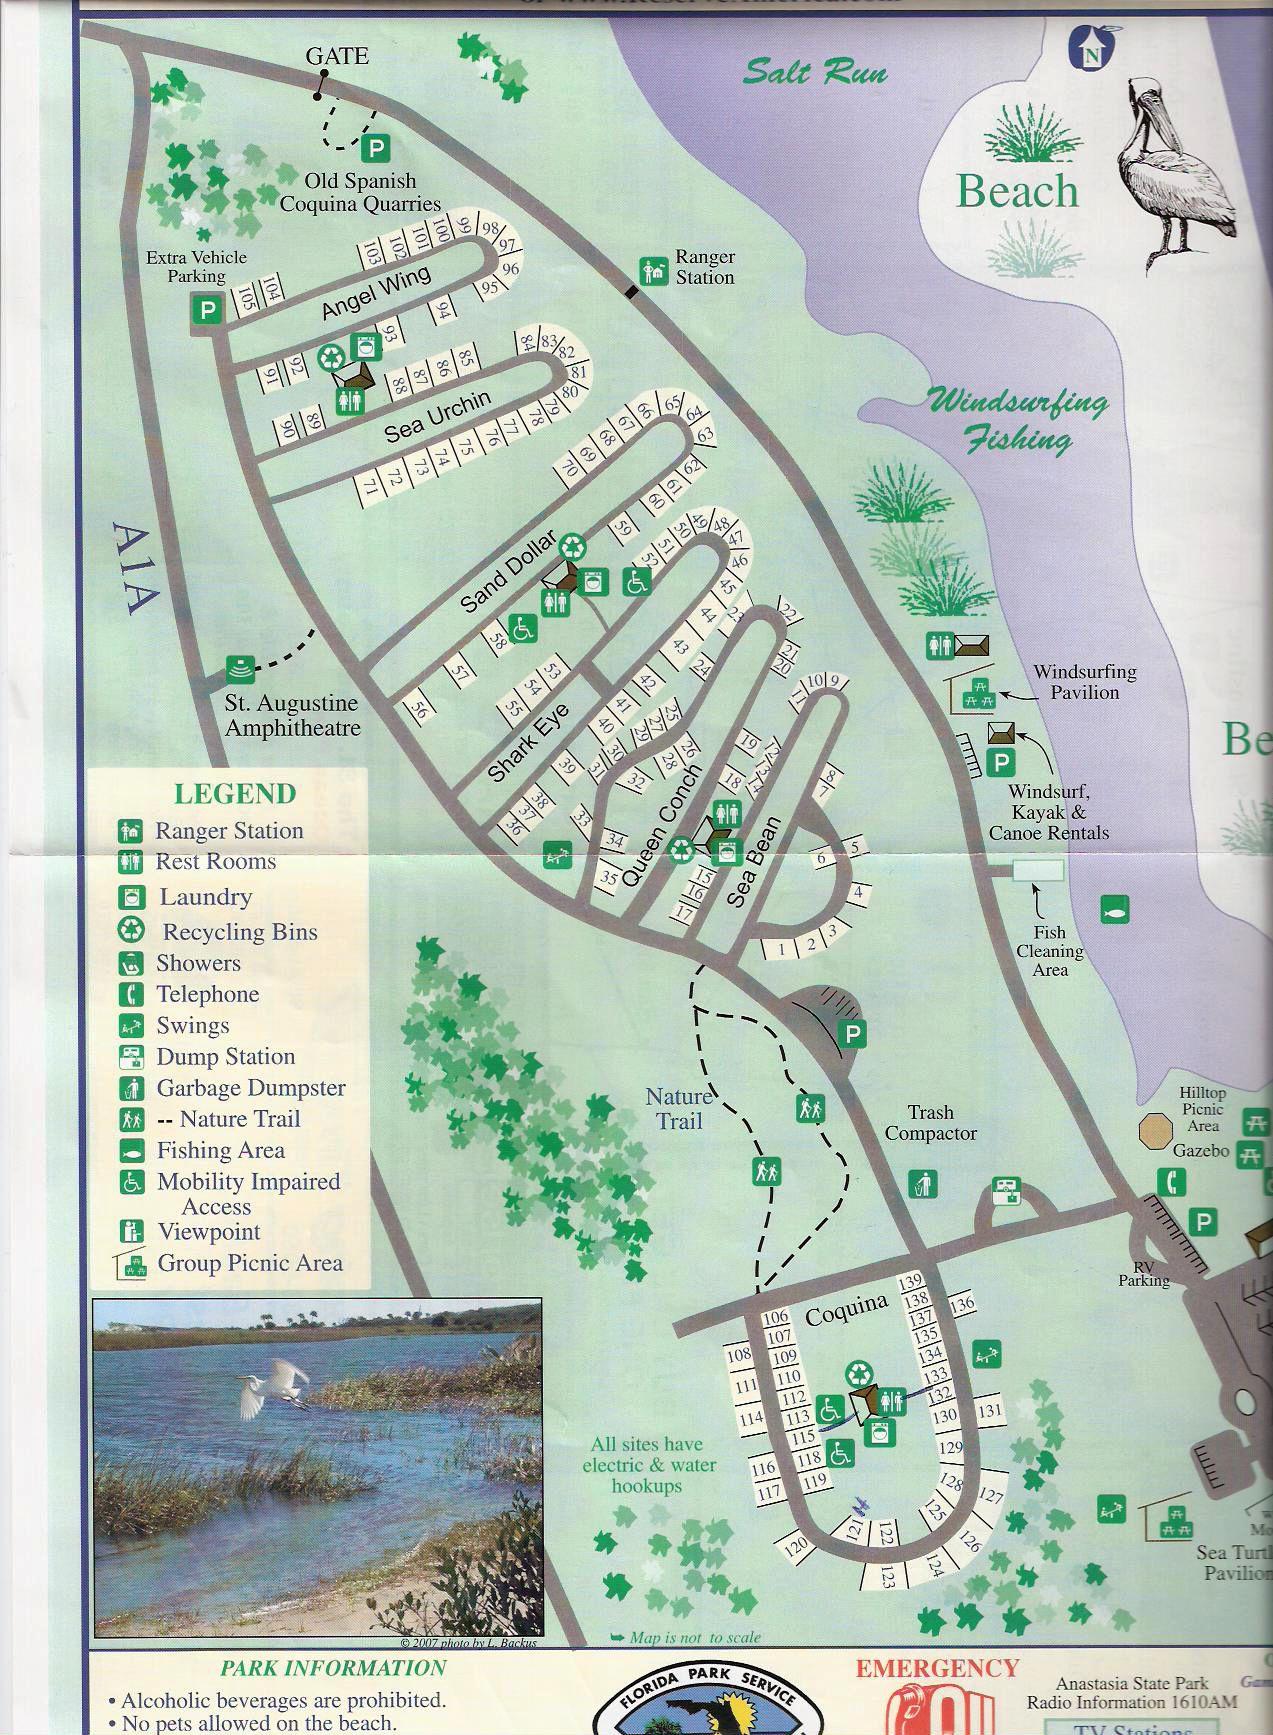 Campground Map - Anastasia State Park - St. Augustine - Florida - Florida Rv Camping Map